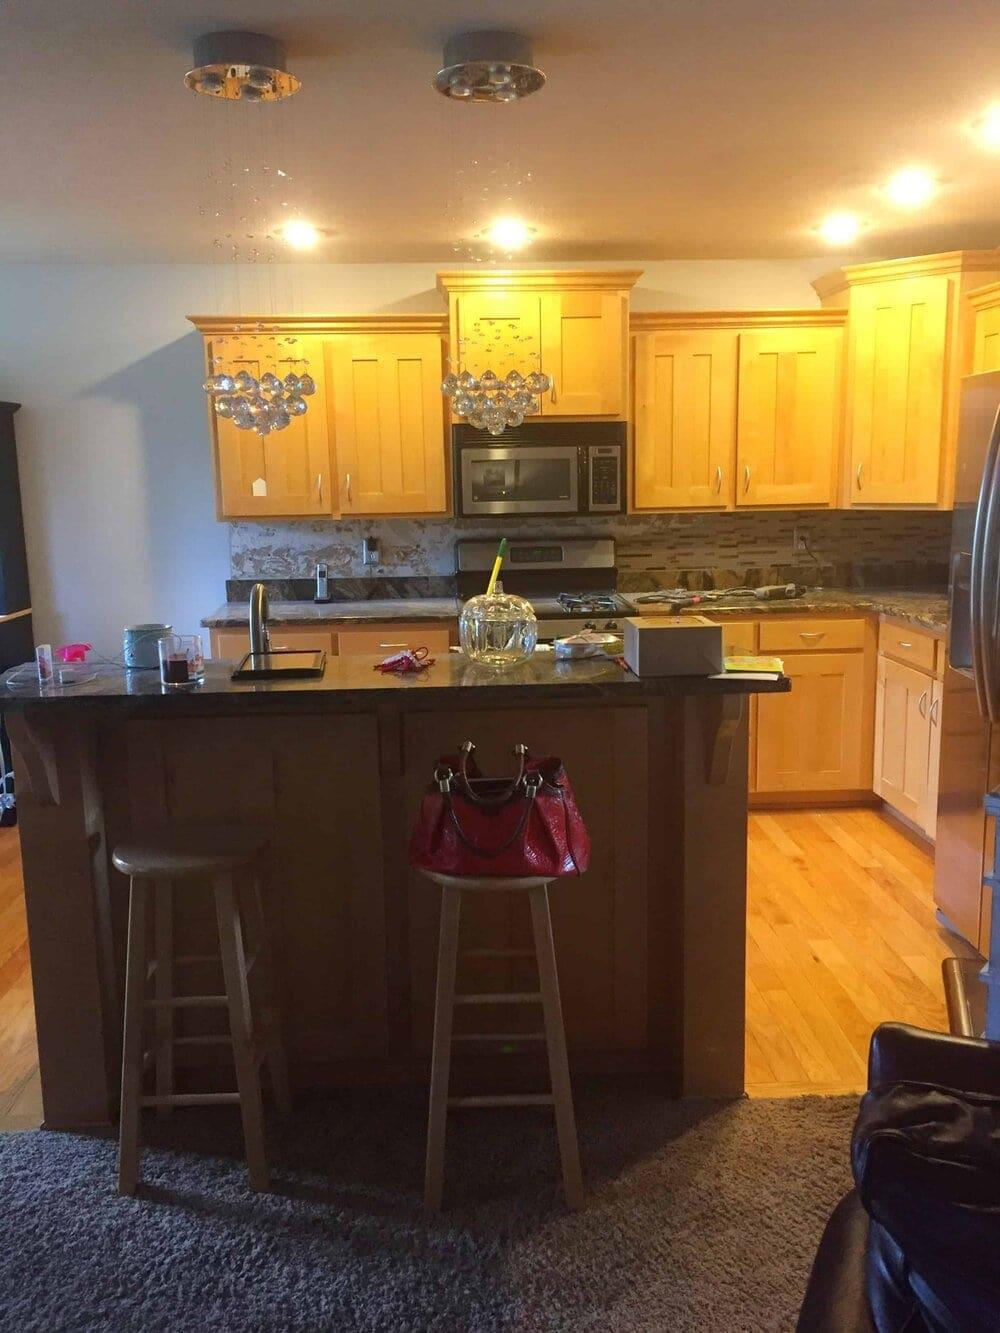 Missouri Girl DIY Kitchen Renovation. Missouri Girl Blog